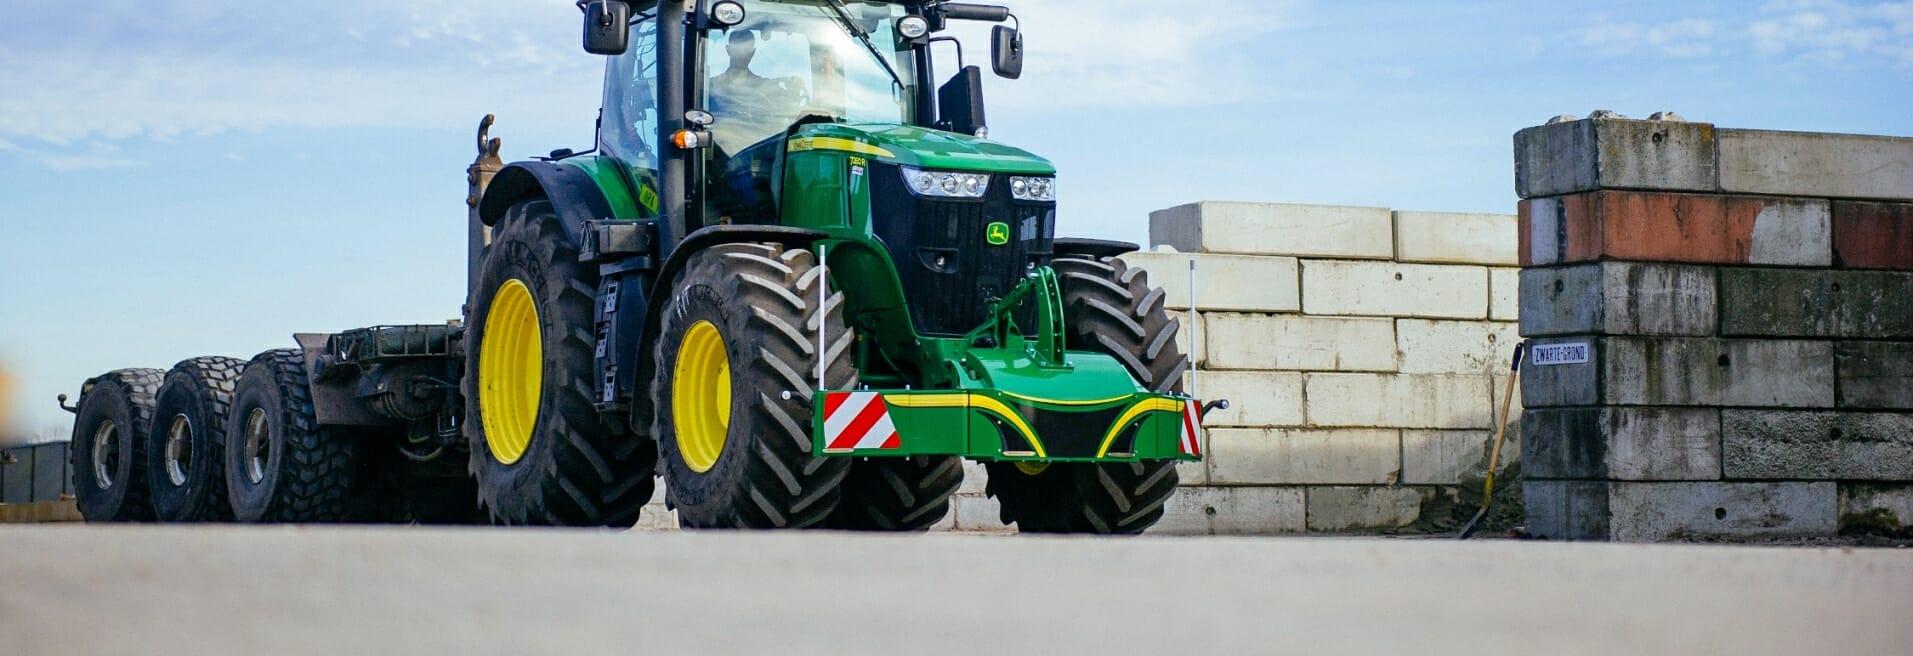 tractorbumper